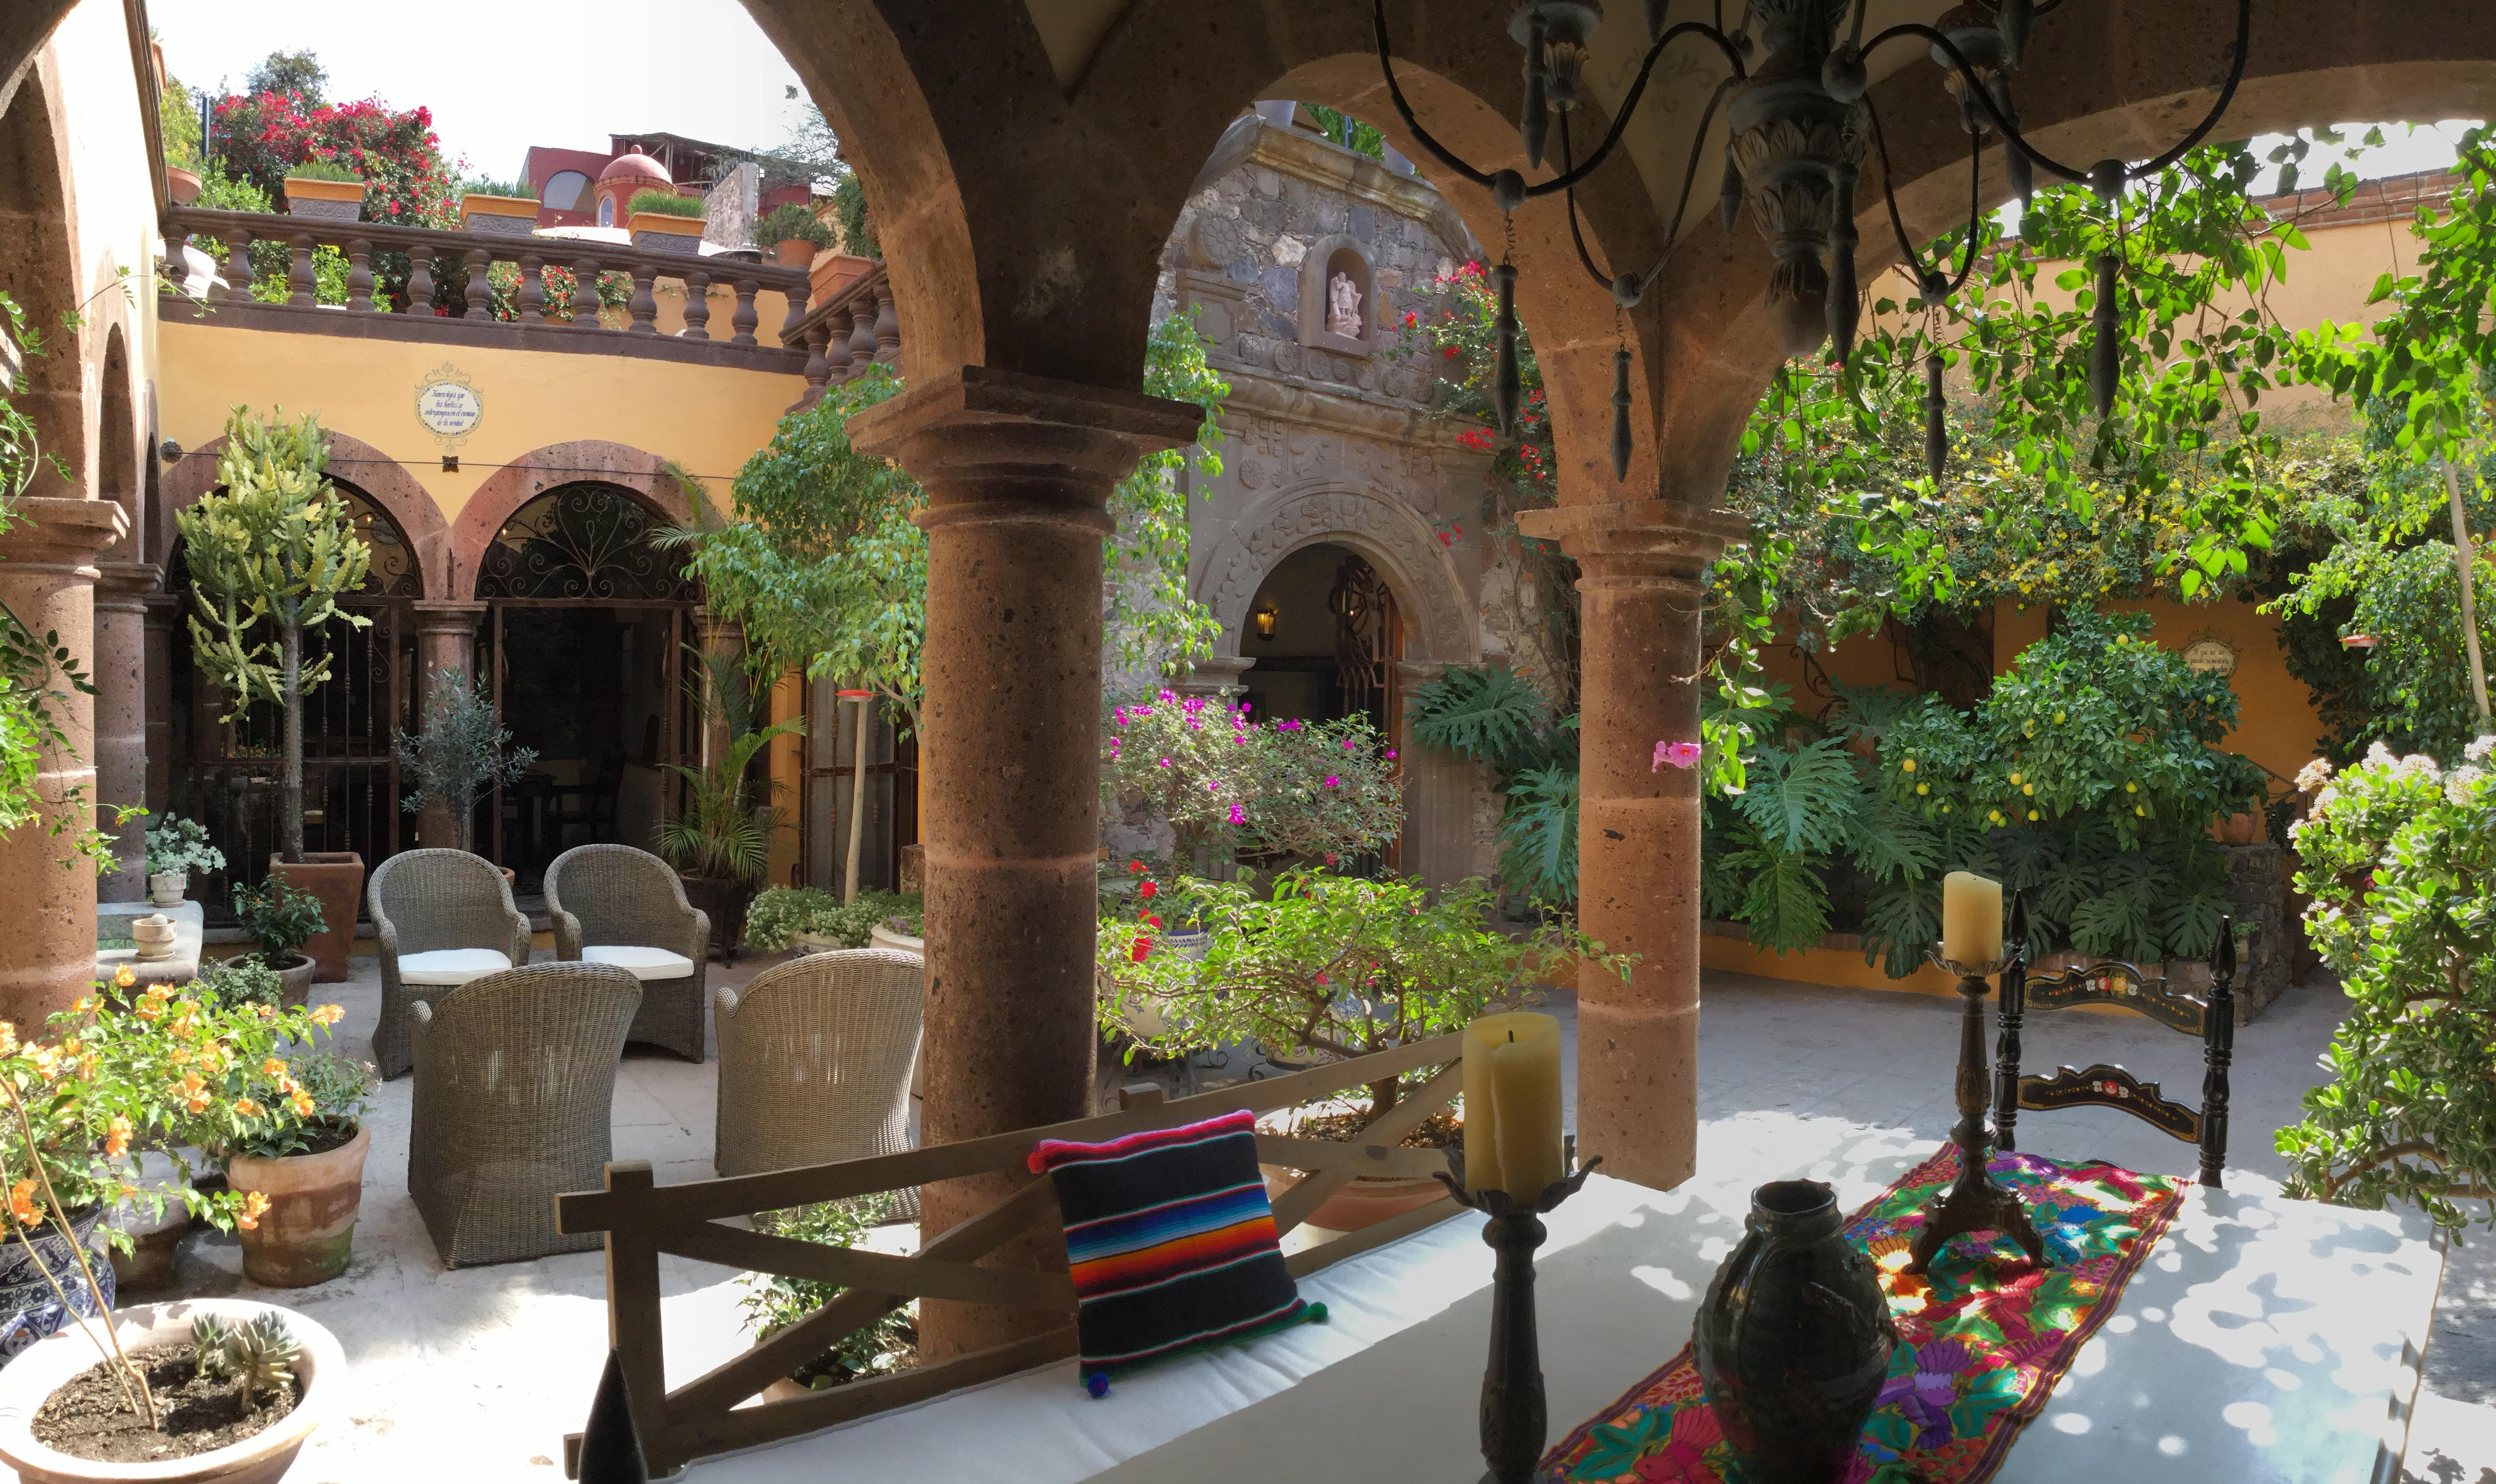 Casa Barranca outdoor seating with dinin